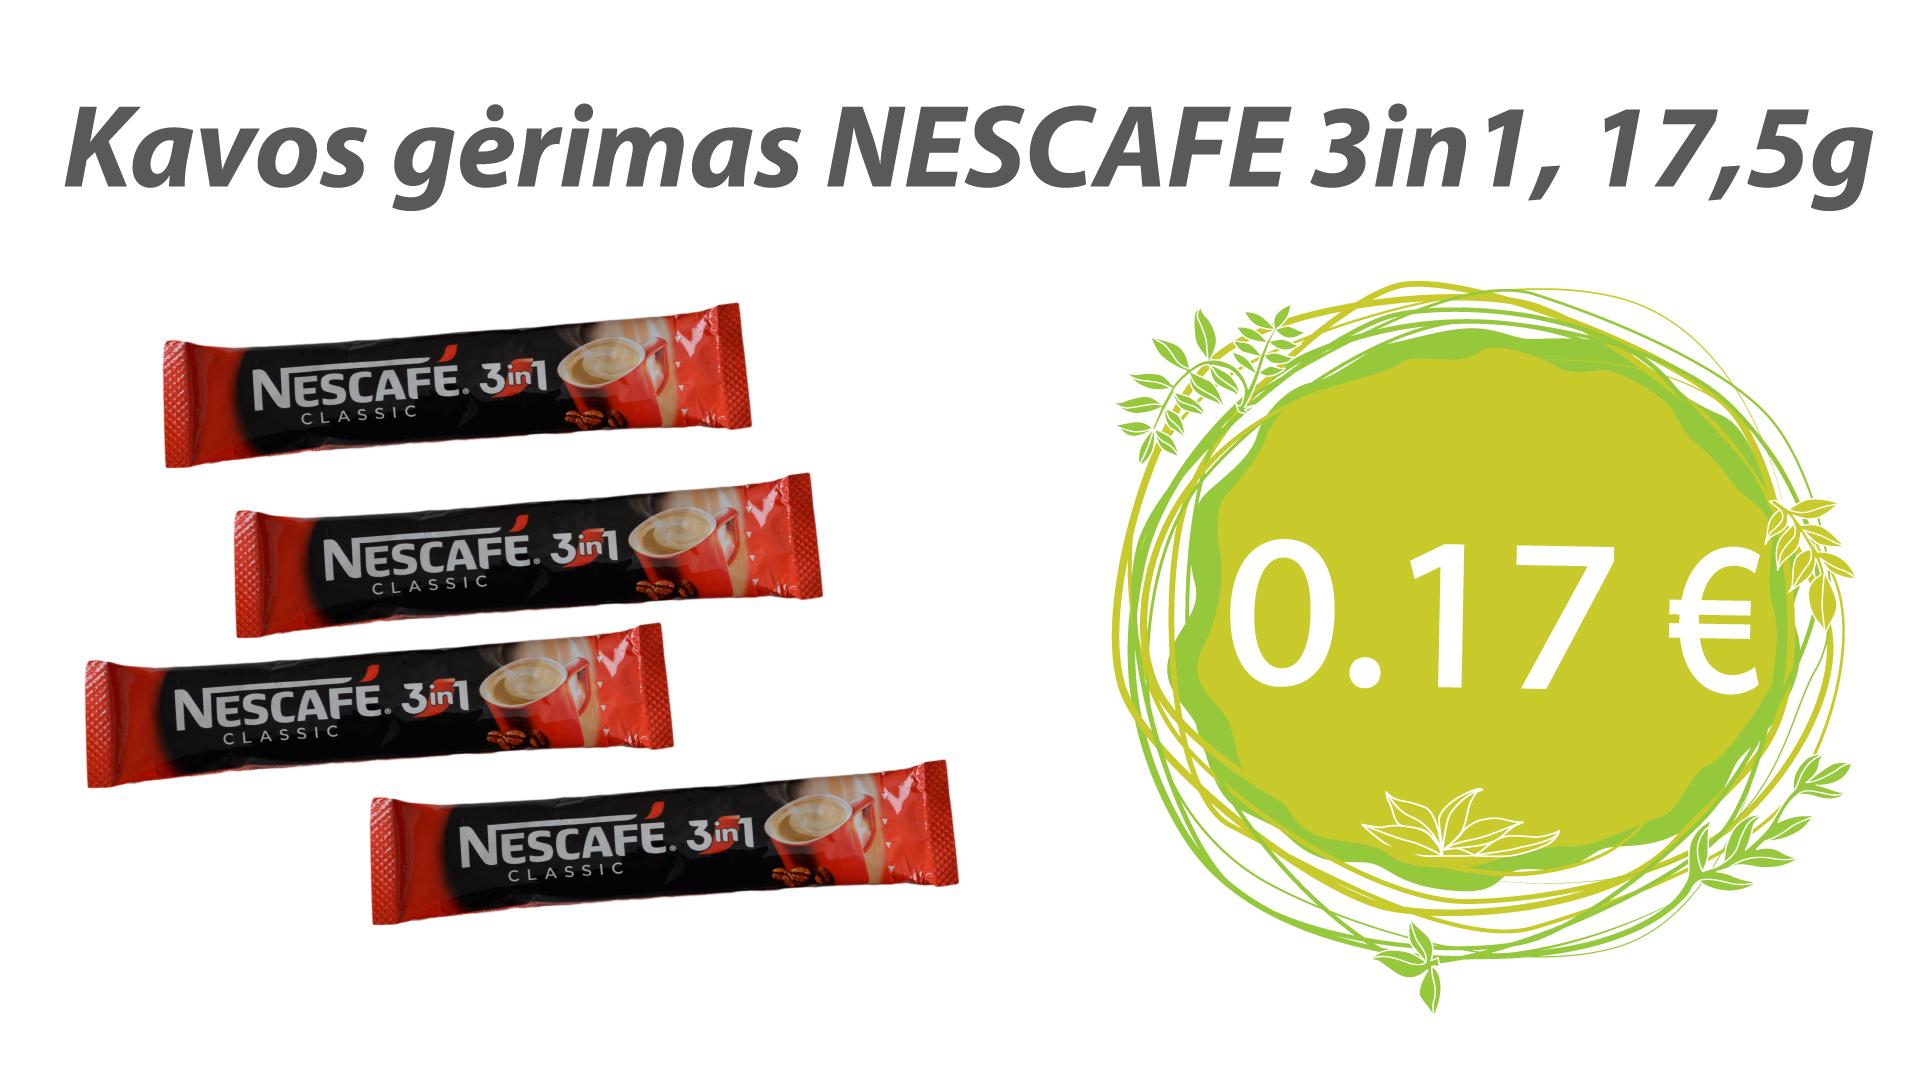 nescafe-3in1-clasic